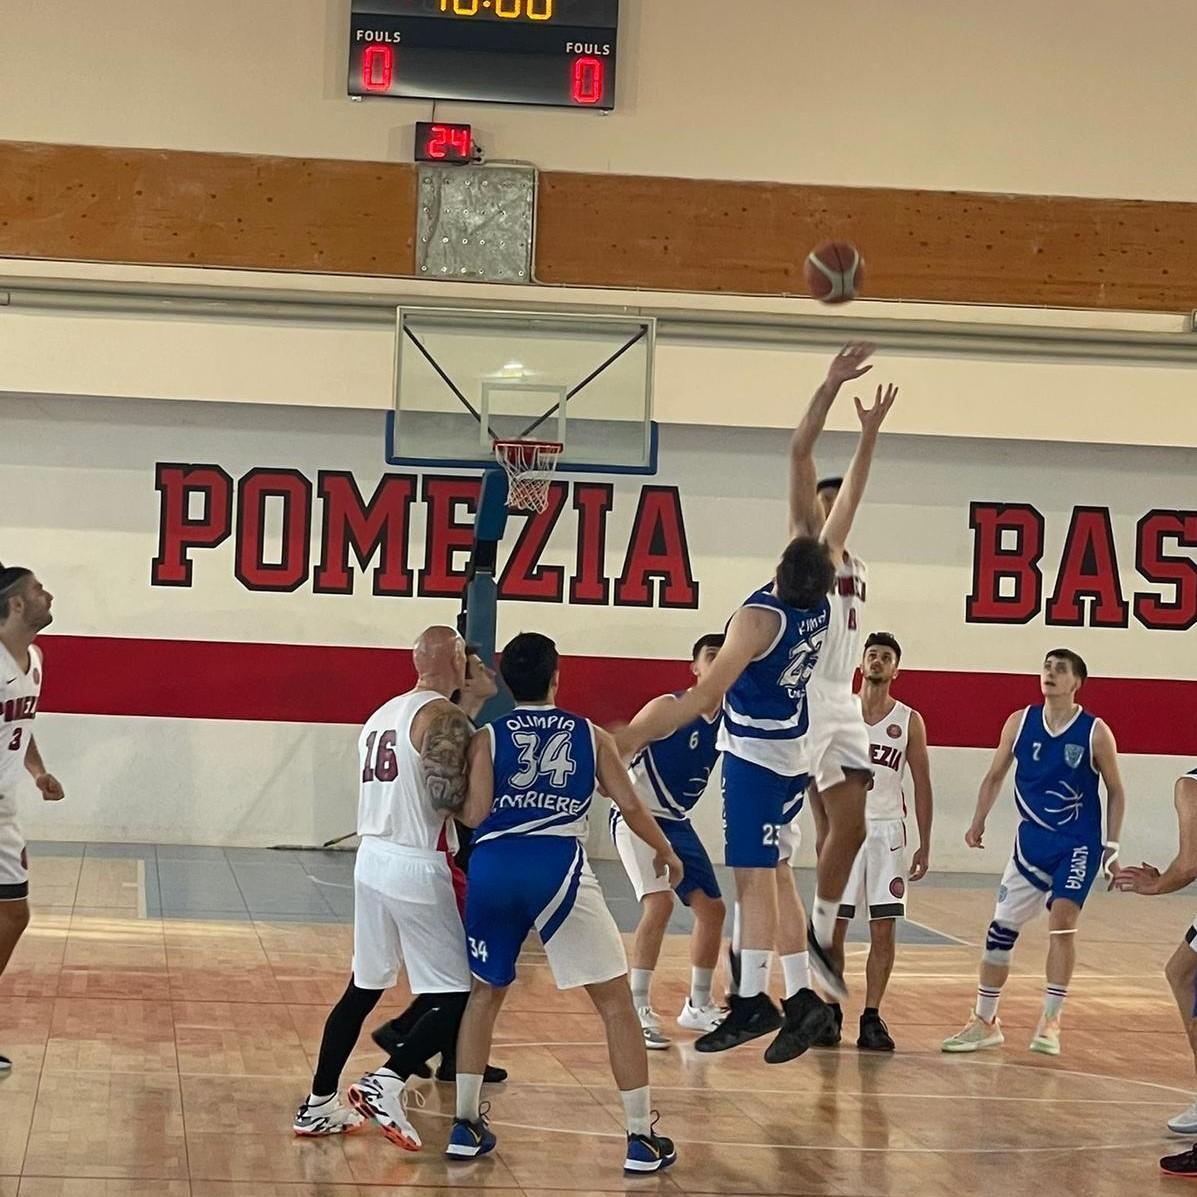 Serie D  Virtus Pomezia - Olimpia Roma  97-45 1